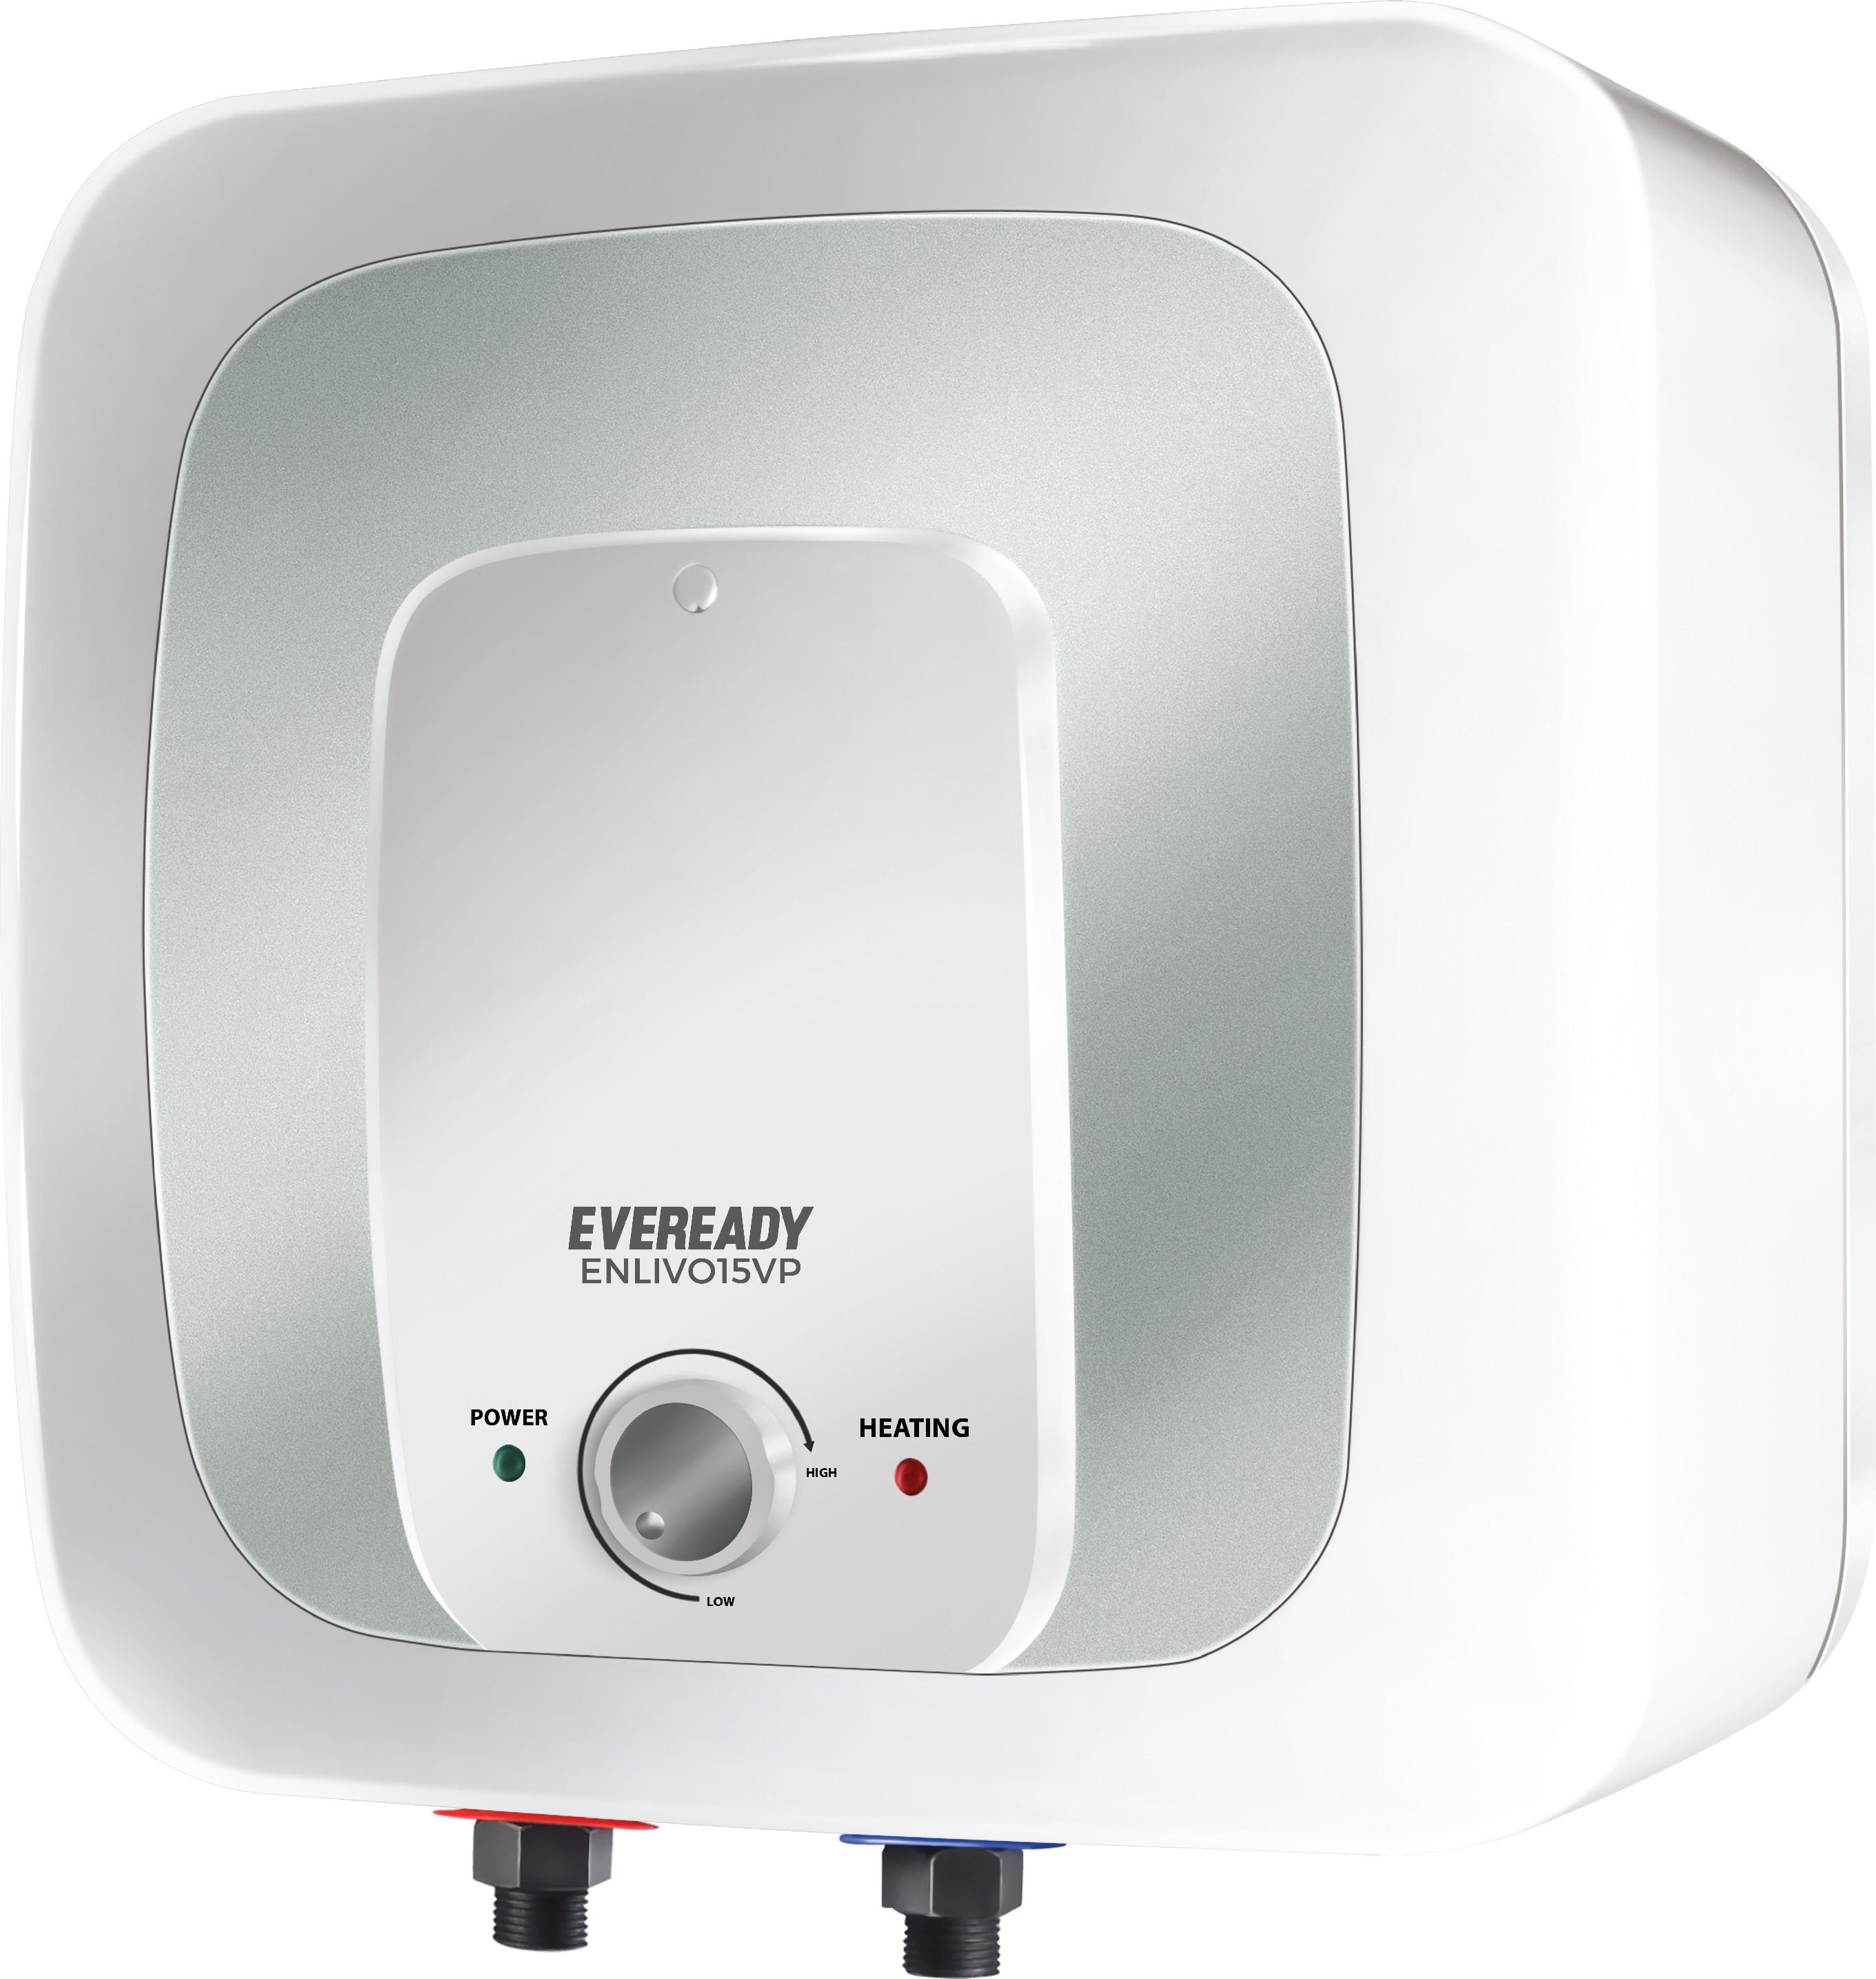 Geyser Water Heater Ao Smith Hse Sas 10 Electric Eveready 15 L Storage Geyserwhite Enlivo15vp